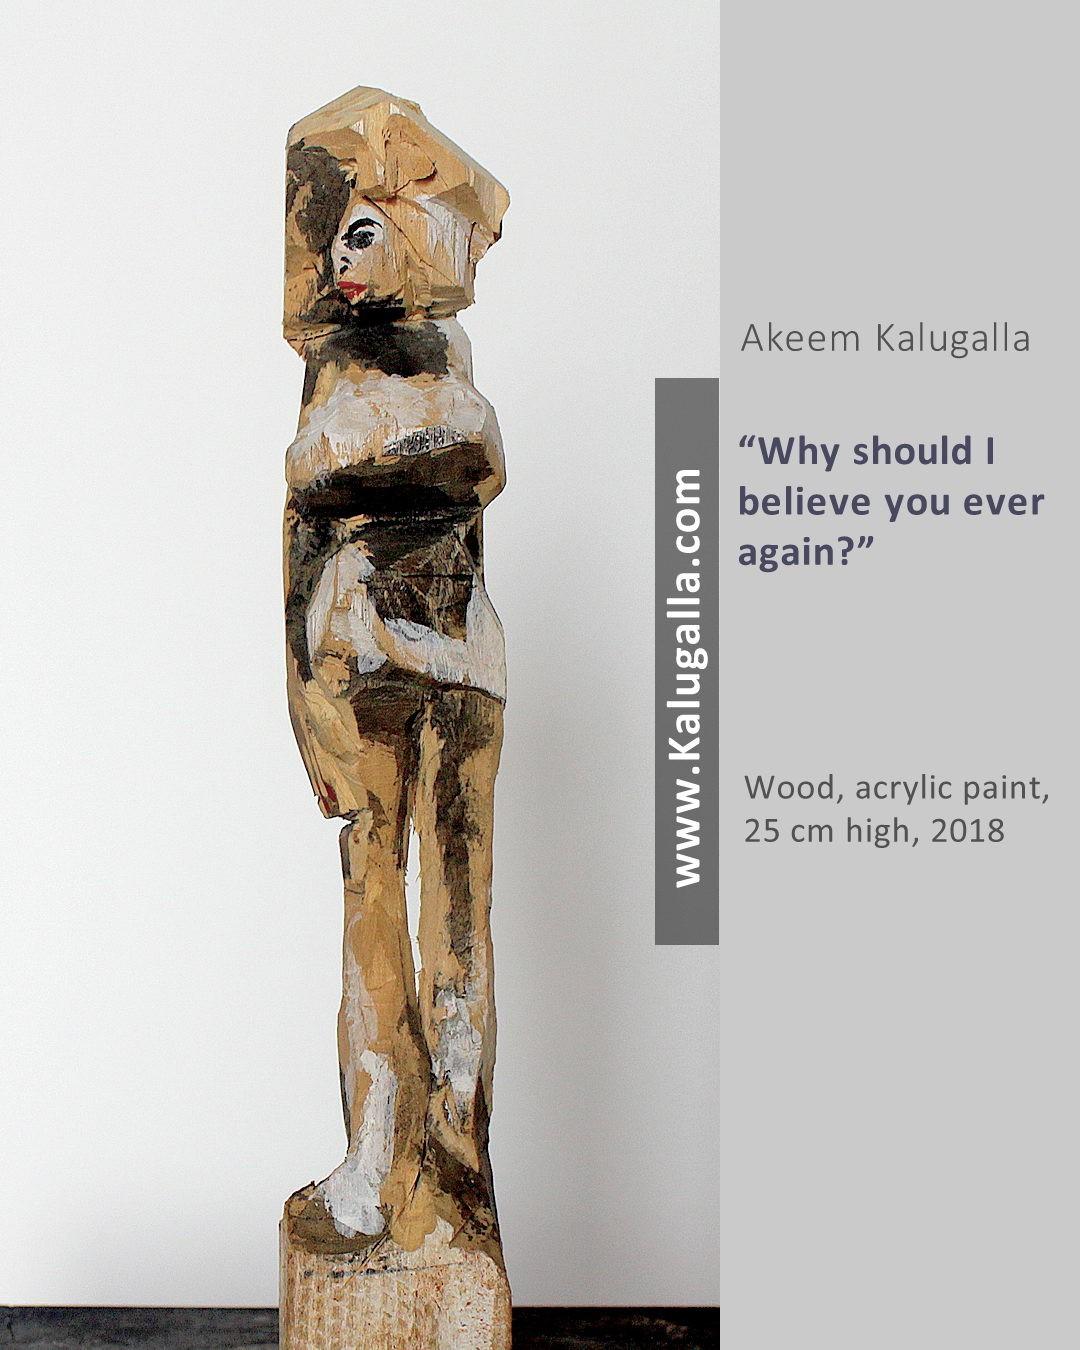 WhyShouldIEverBelieveYouAgain? by Akeem Kalugalla